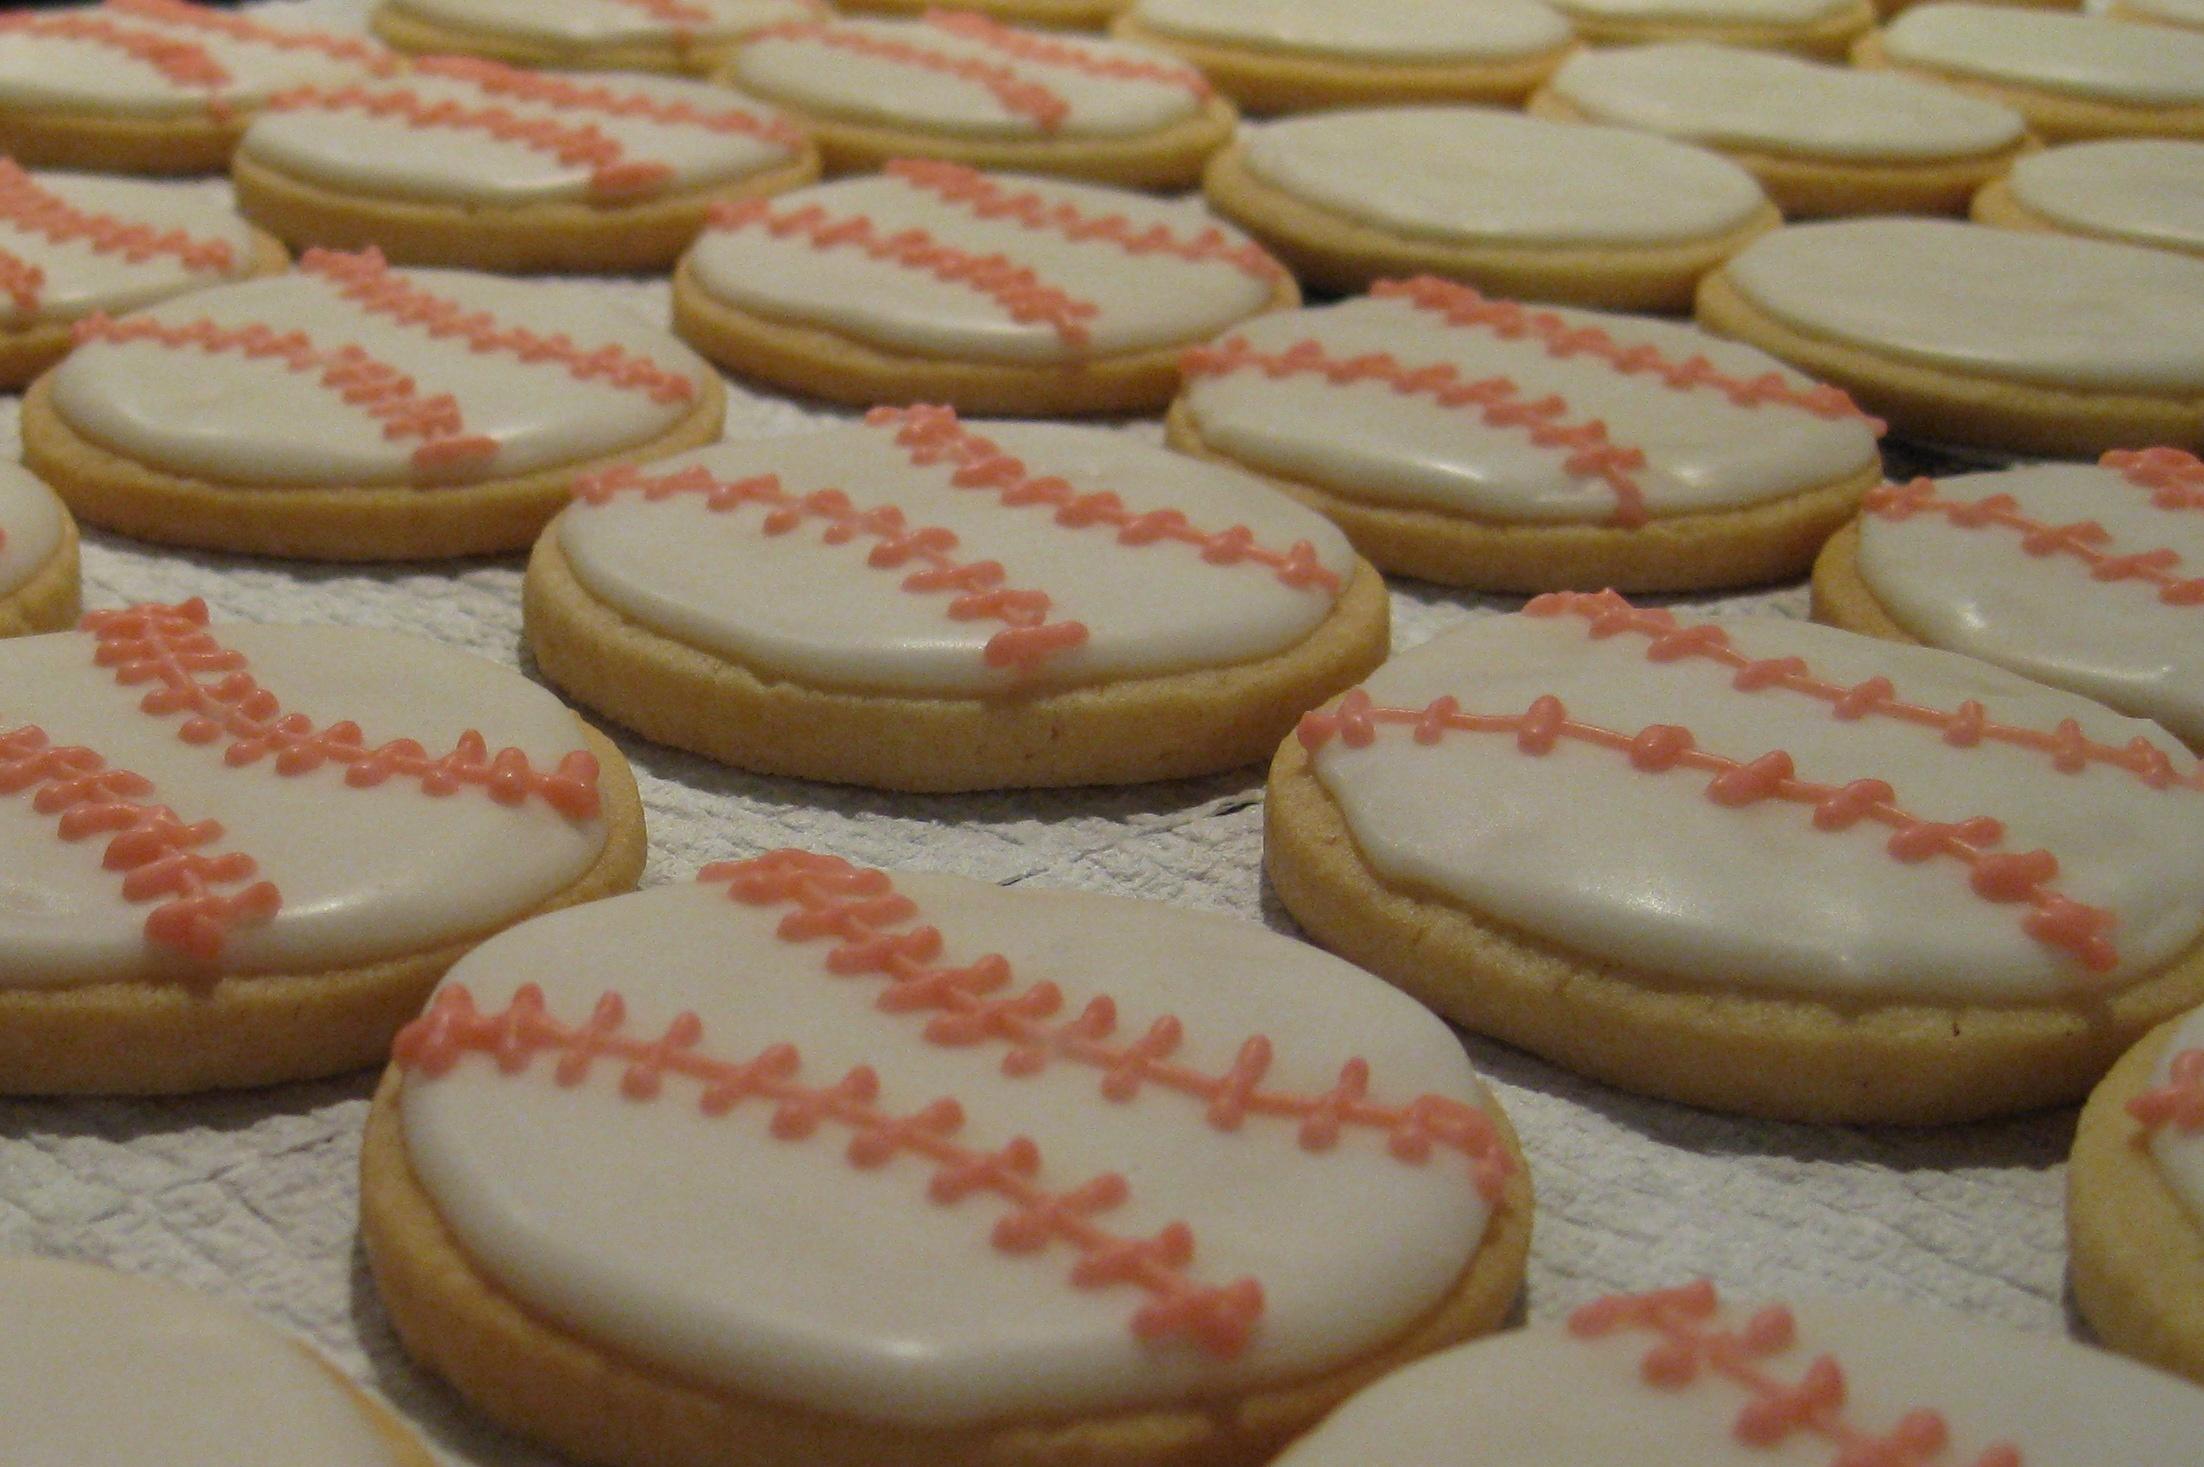 Cakes, cake, Cupcakes, Cookies, Cupcake, Bakery, Jersey city